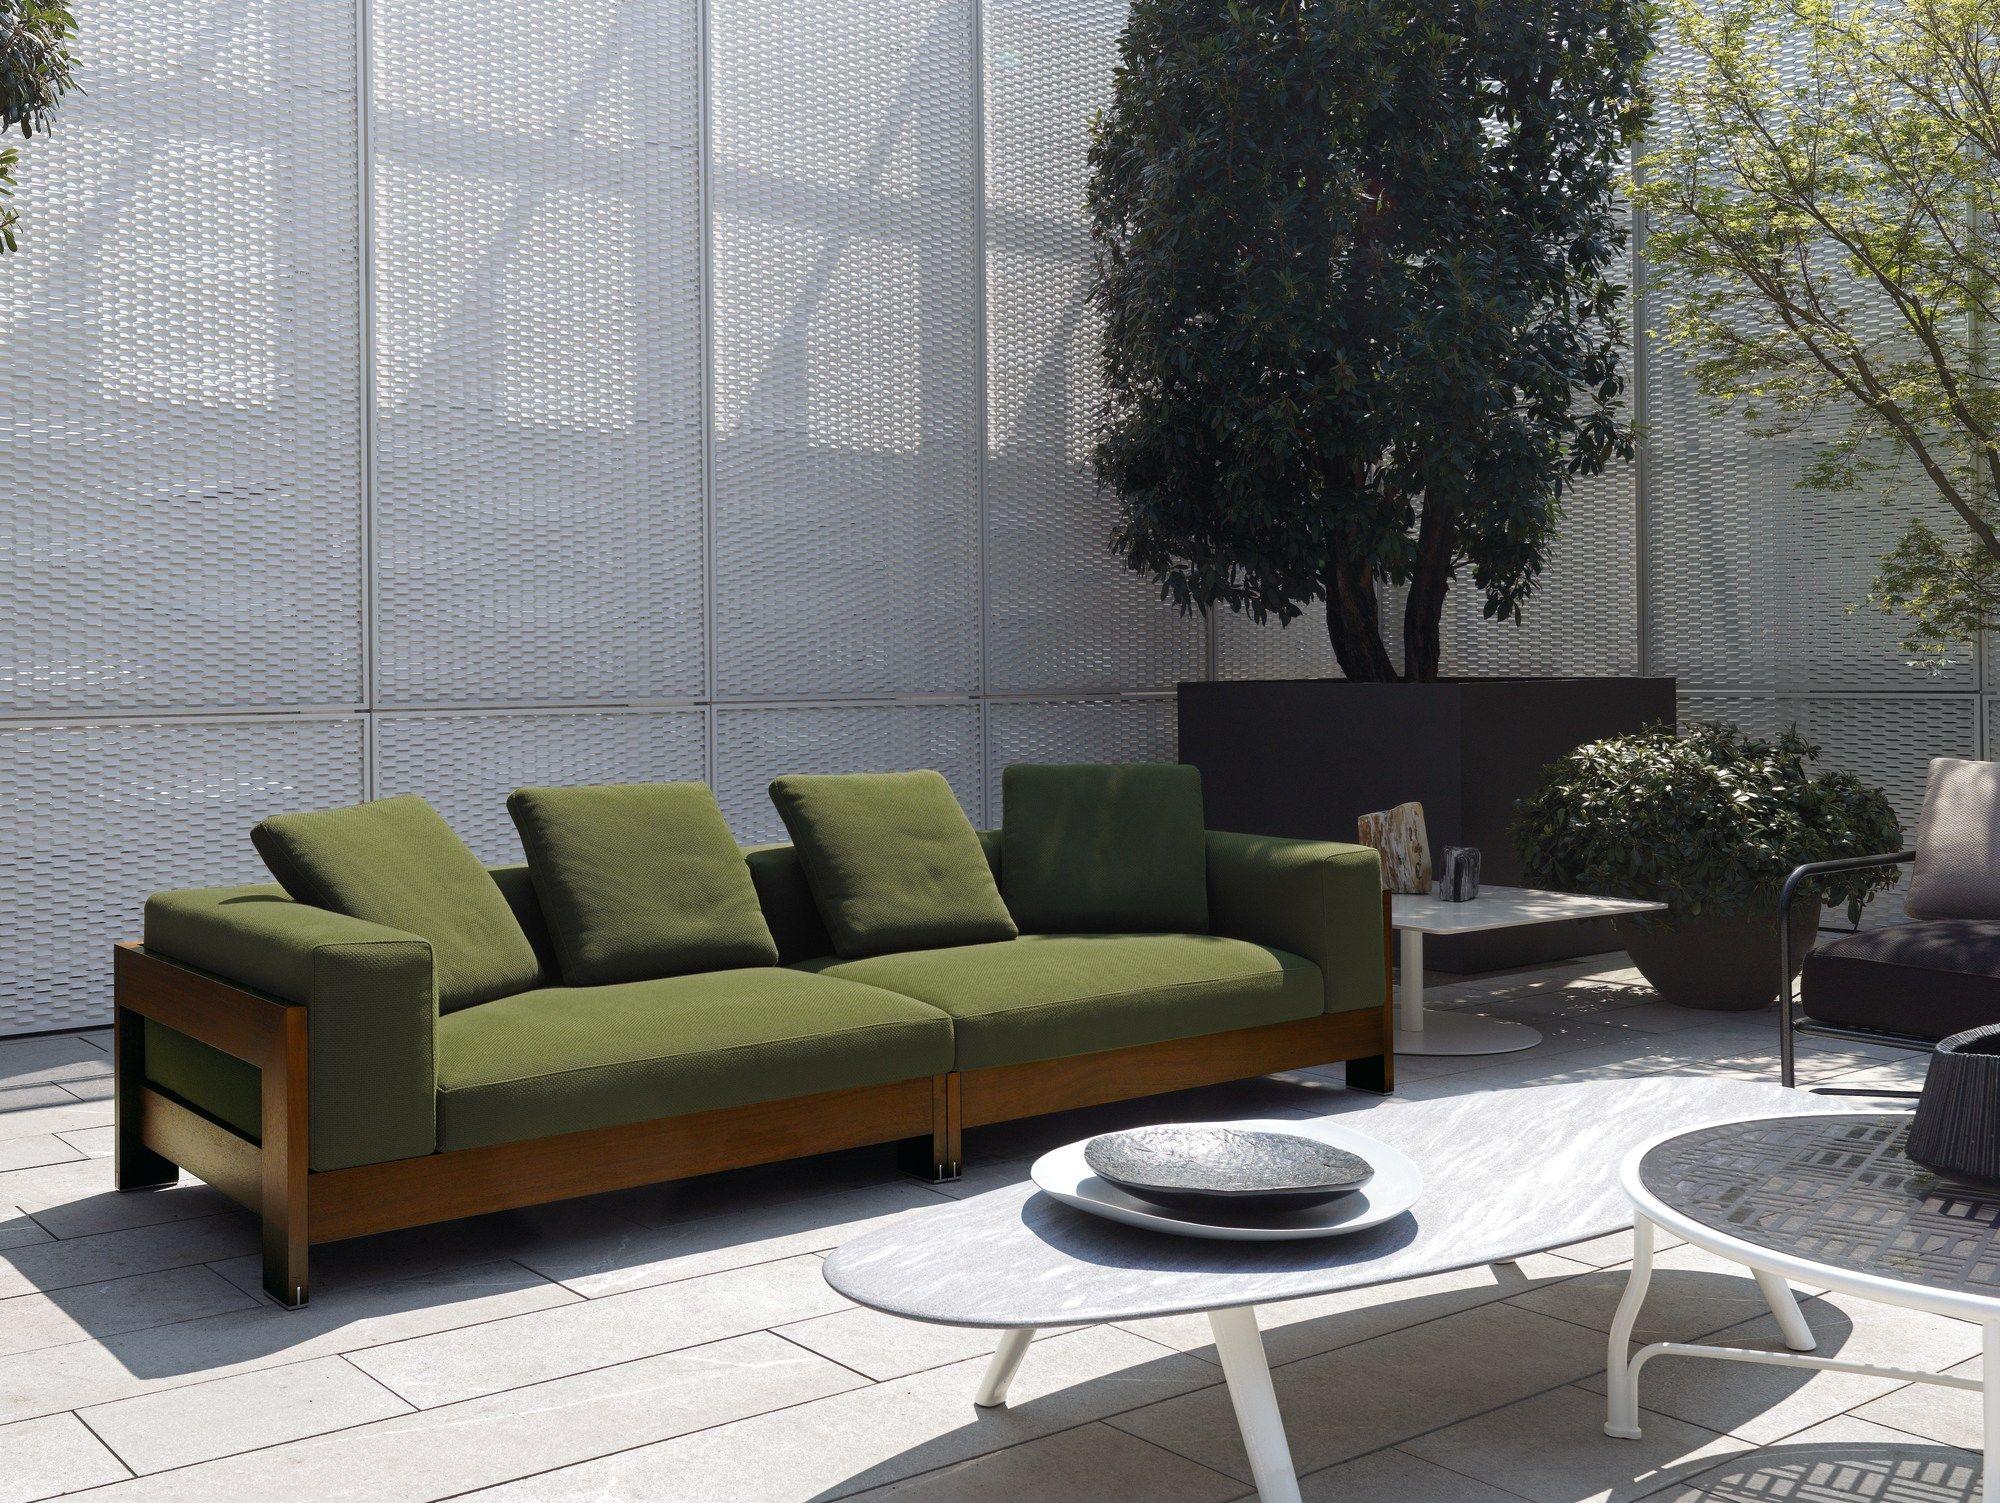 Alison iroko outdoor by minotti design roberto minotti for Sofa exterior de obra